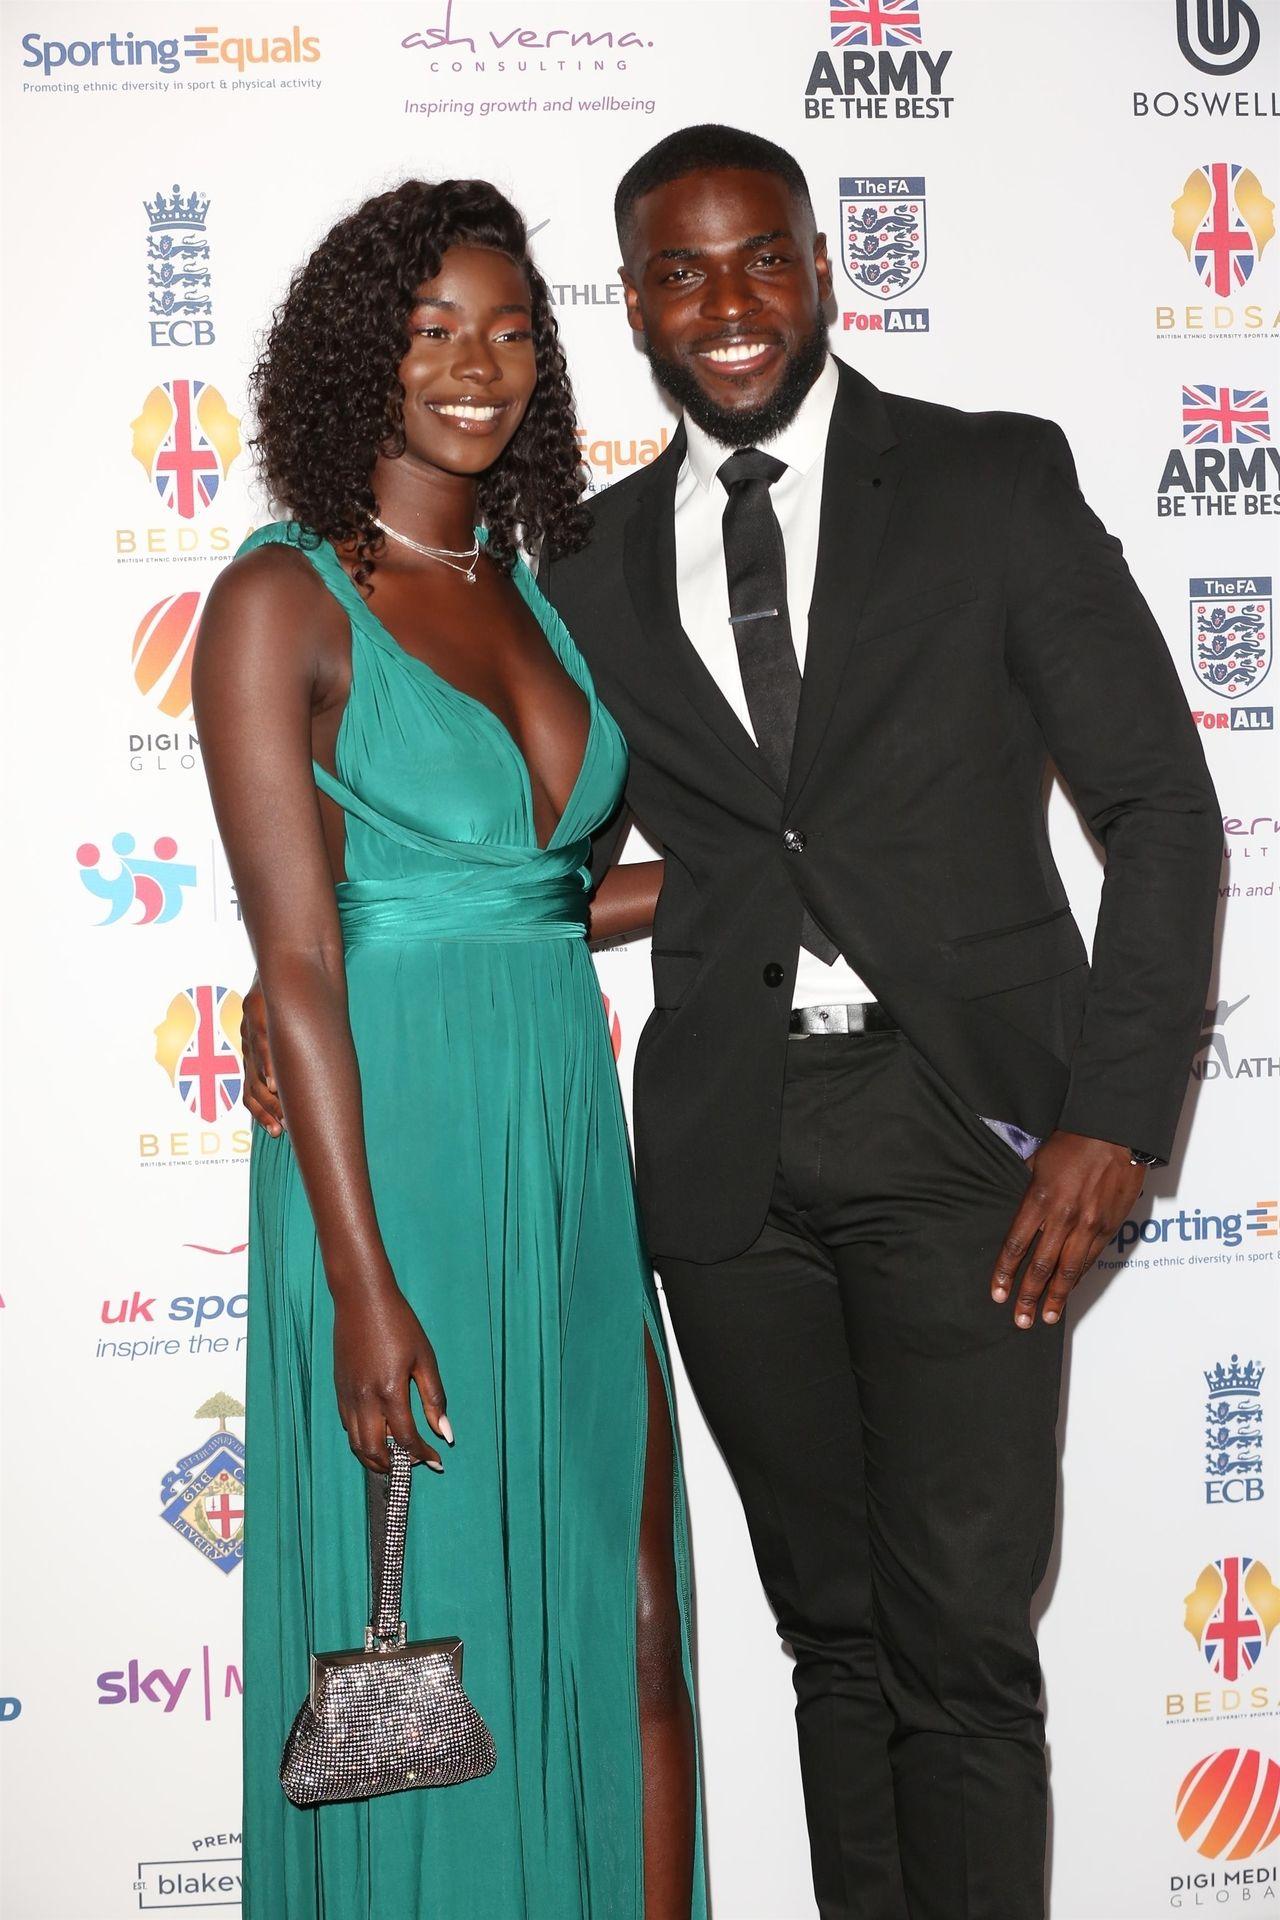 Mike Boateng & Priscilla Anyabu Are Seen At British Ethnic Diversity Sports Awards 0009